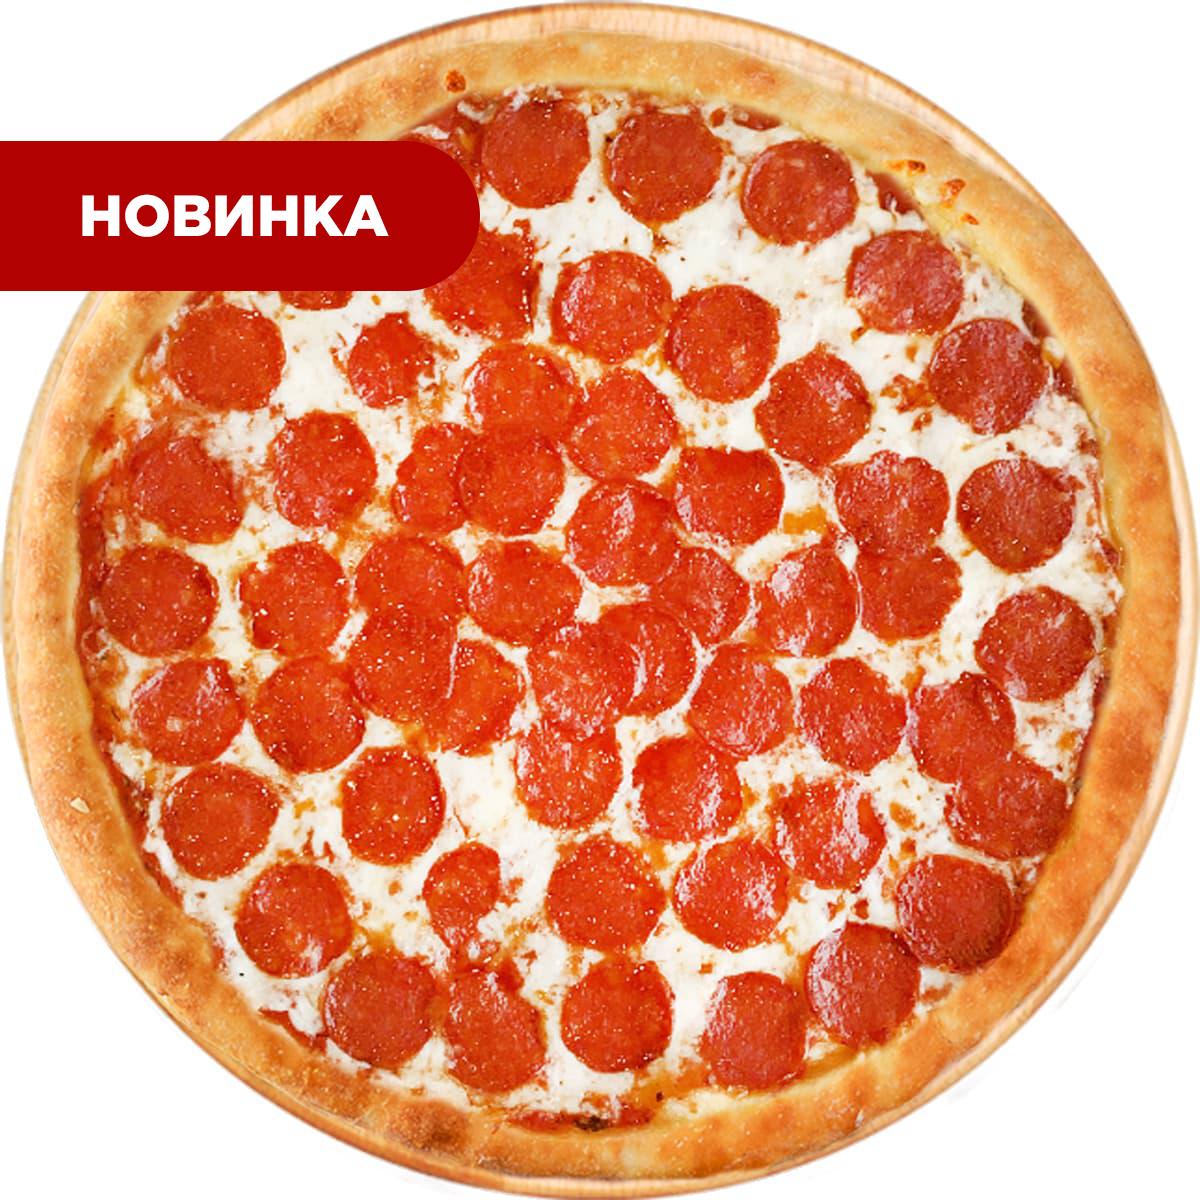 пицца дабл пепперони новинка